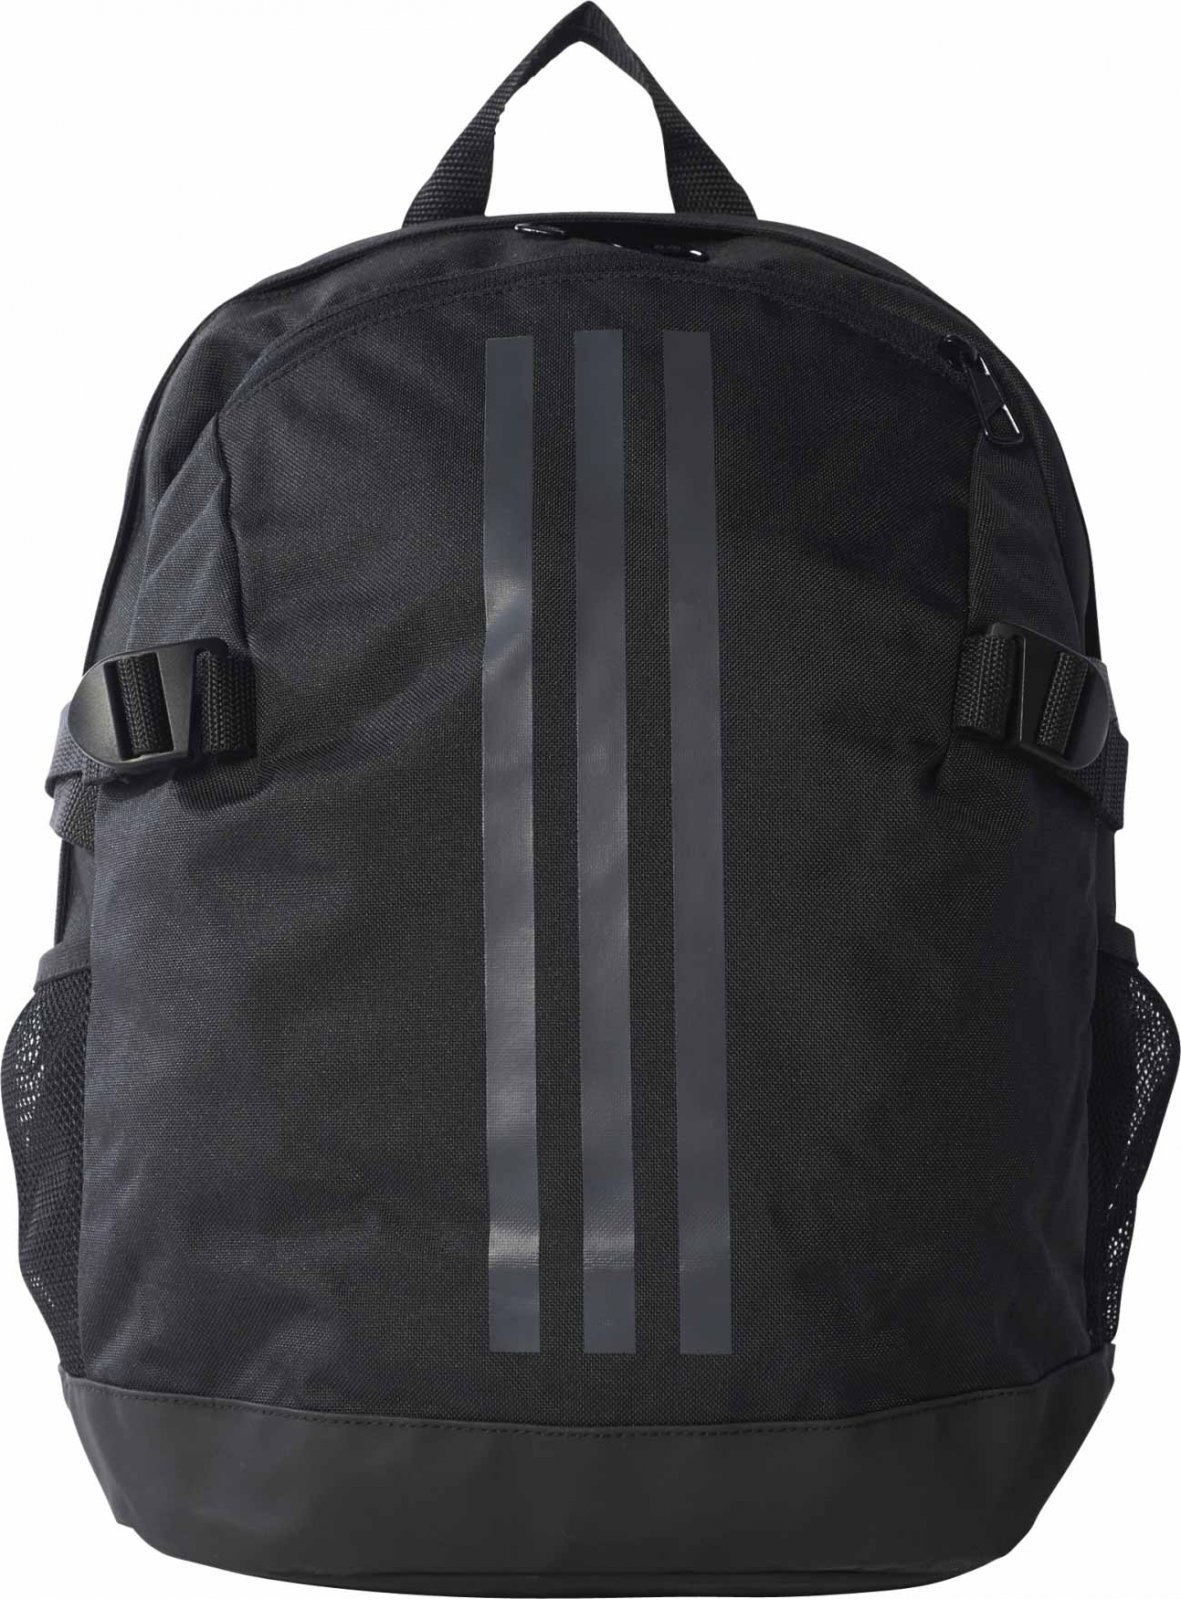 Adidas 3-Stripes Power Small 20 l od 499 Kč • Zboží.cz 4d08c8b202